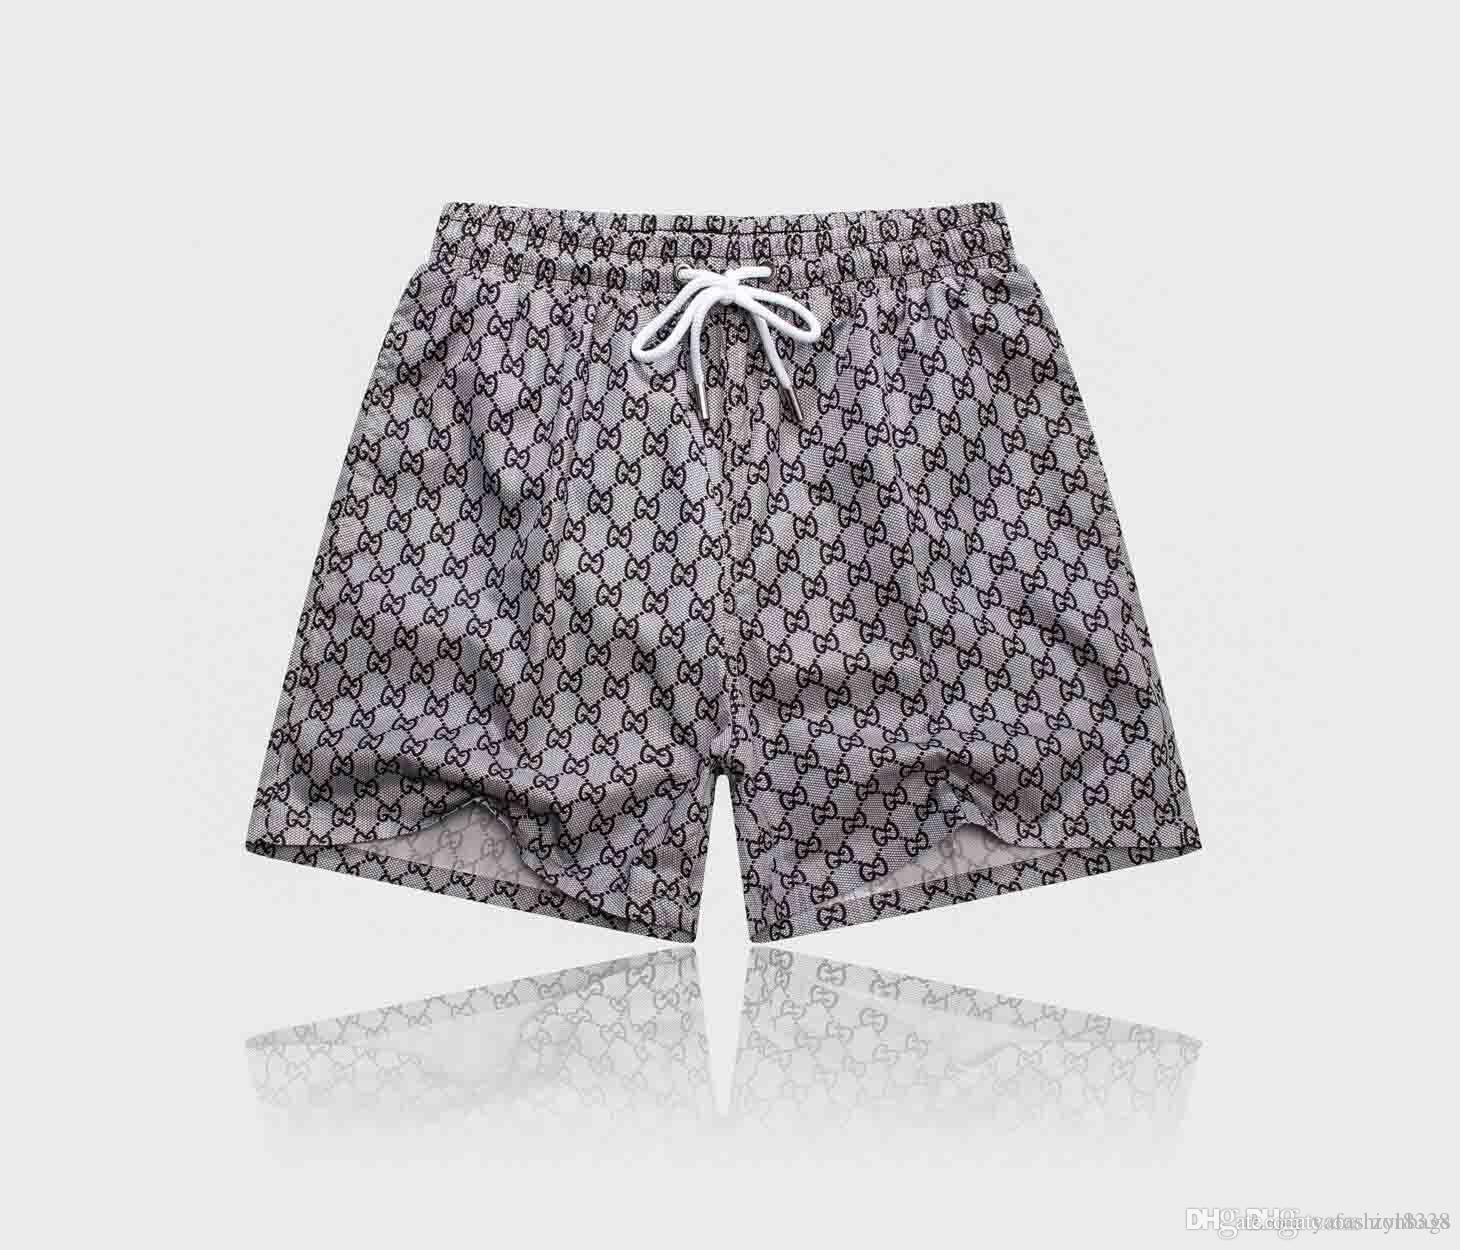 Estate Shorts Mens Via elegante Jogger Mesh Shorts casual Hip Hop traspirante Mens Pantaloni felpa taglia M-XXL